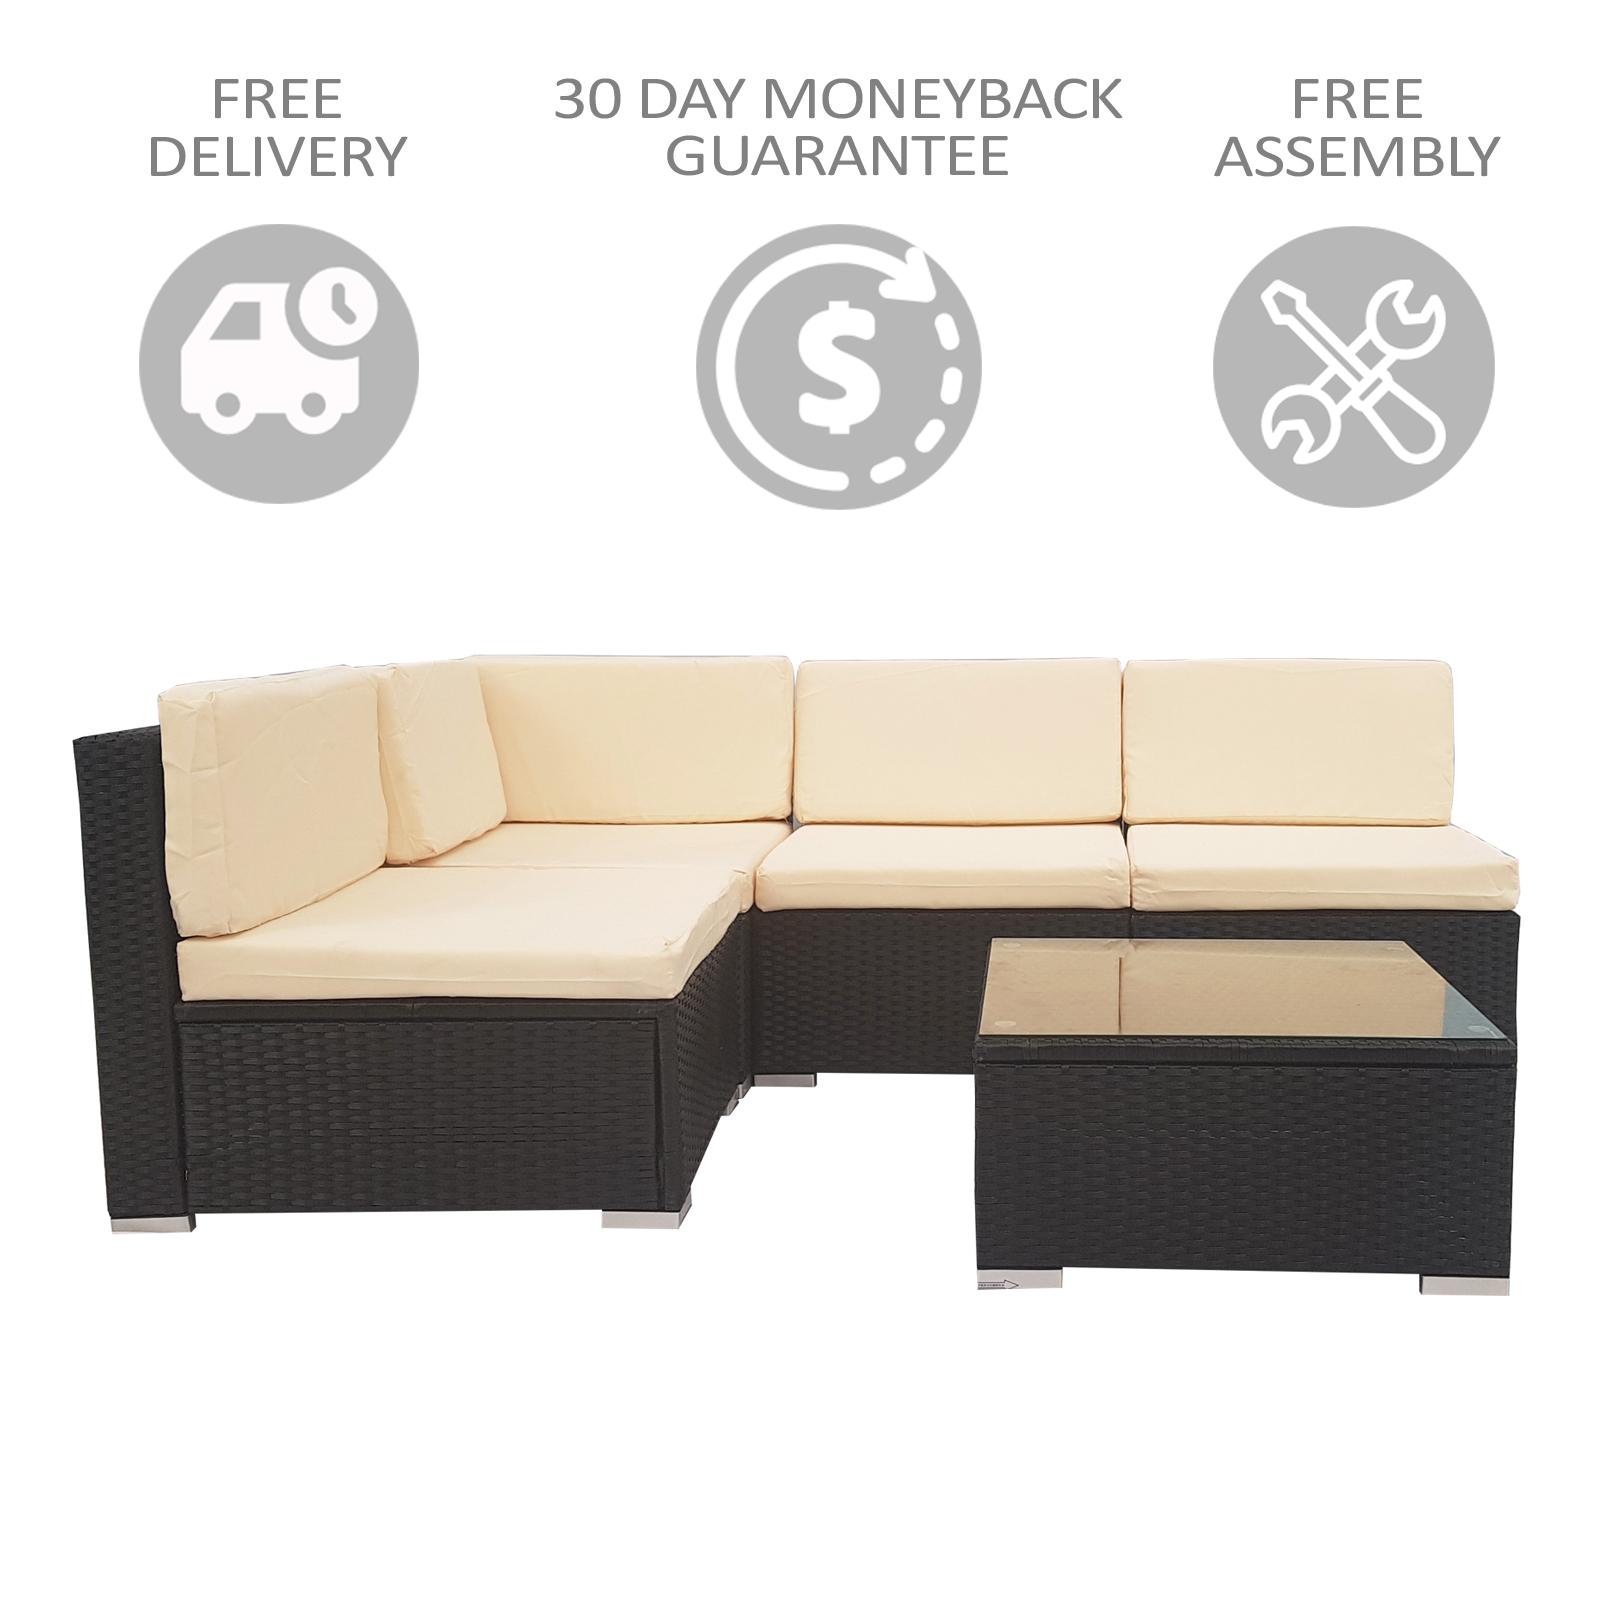 Awe Inspiring 5 Piece White Rattan Wicker Outdoor Furniture Sofa Set Lamtechconsult Wood Chair Design Ideas Lamtechconsultcom